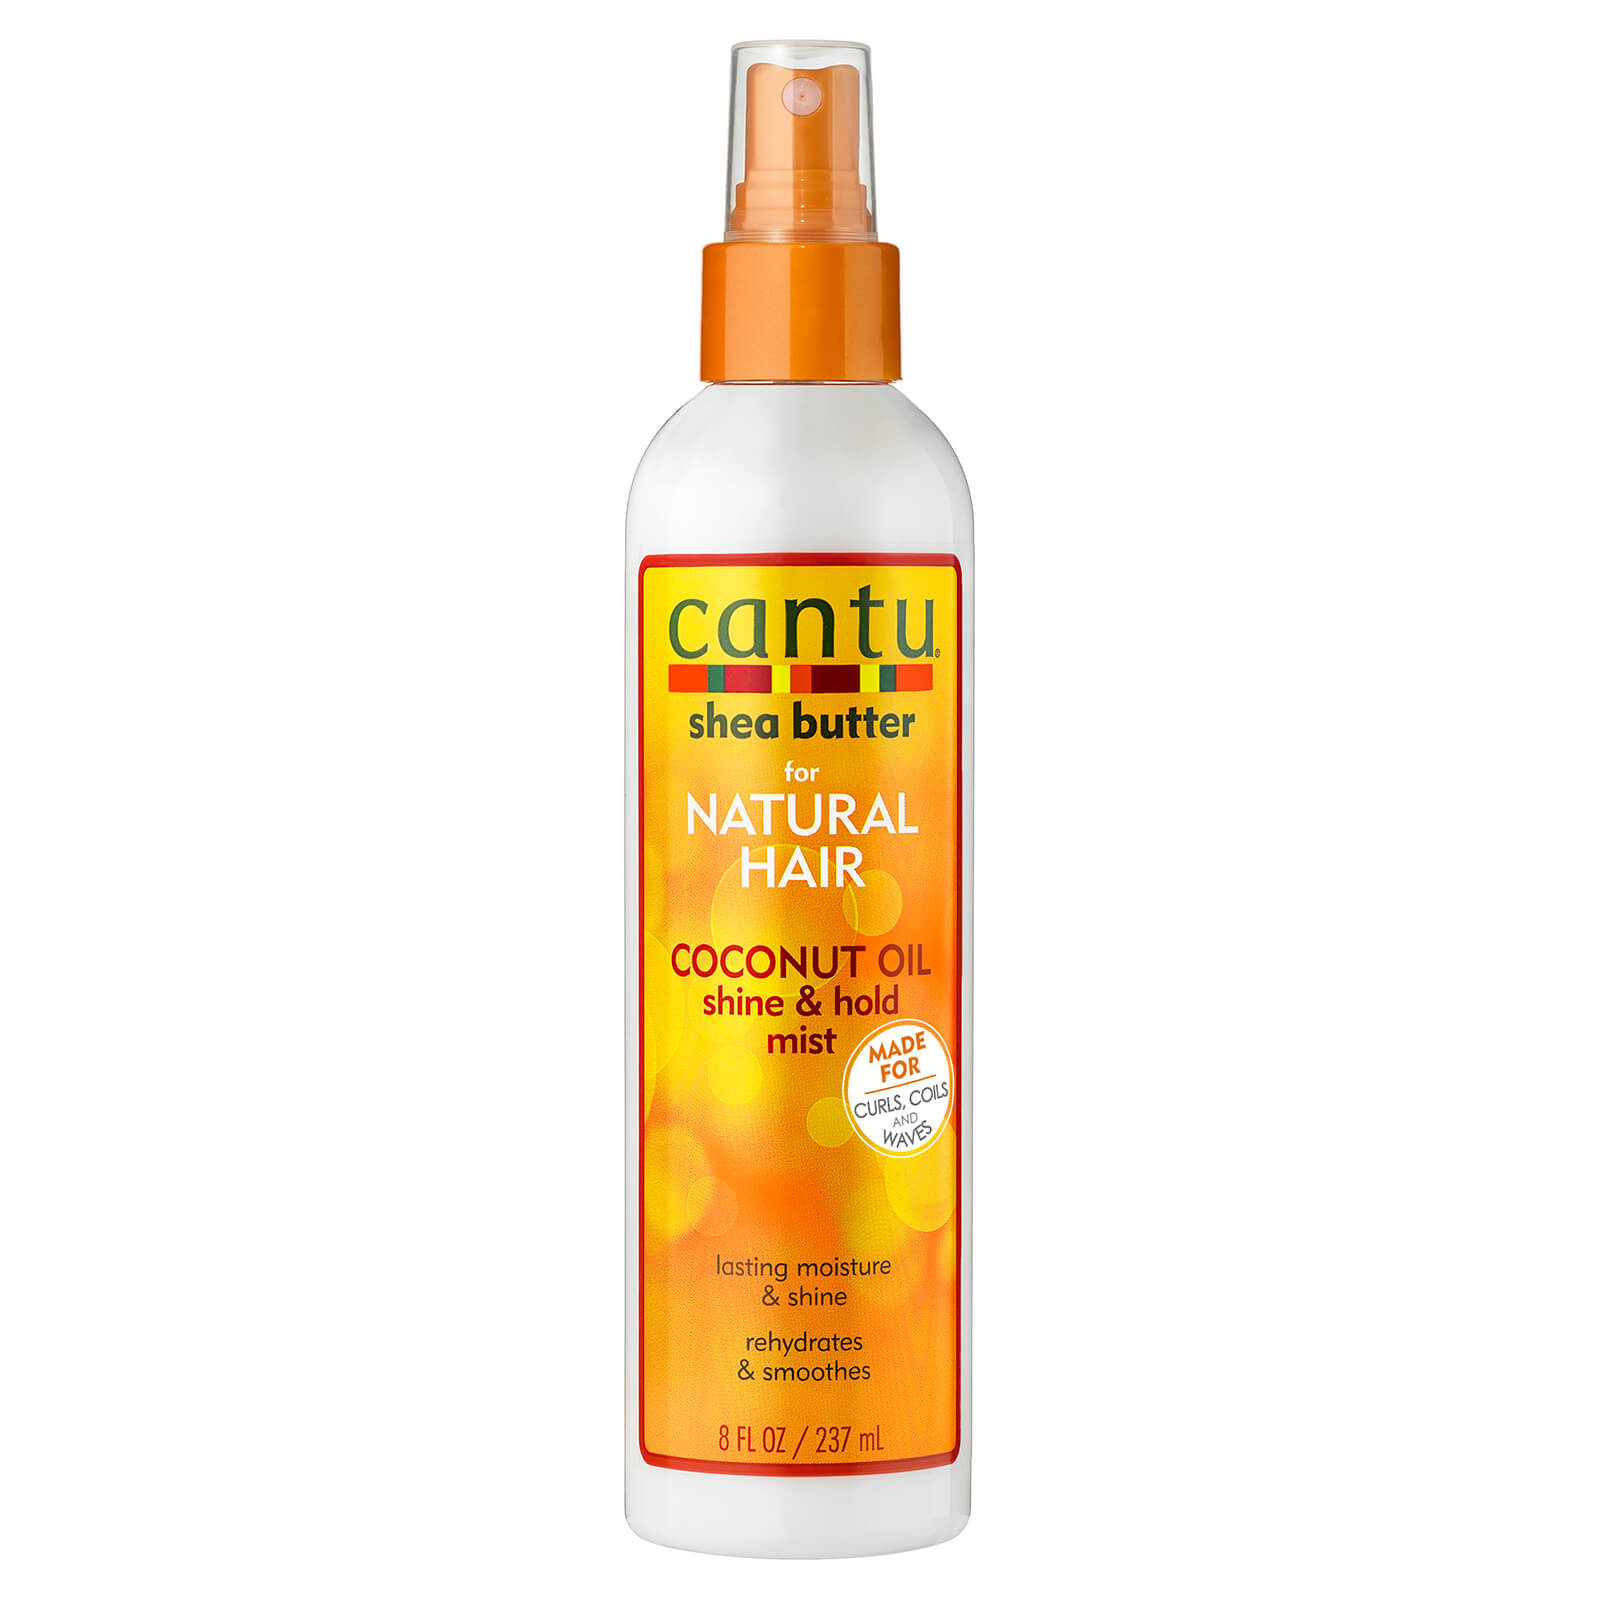 Купить Cantu Shea Butter for Natural Hair Coconut Oil Shine & Hold Mist 237ml